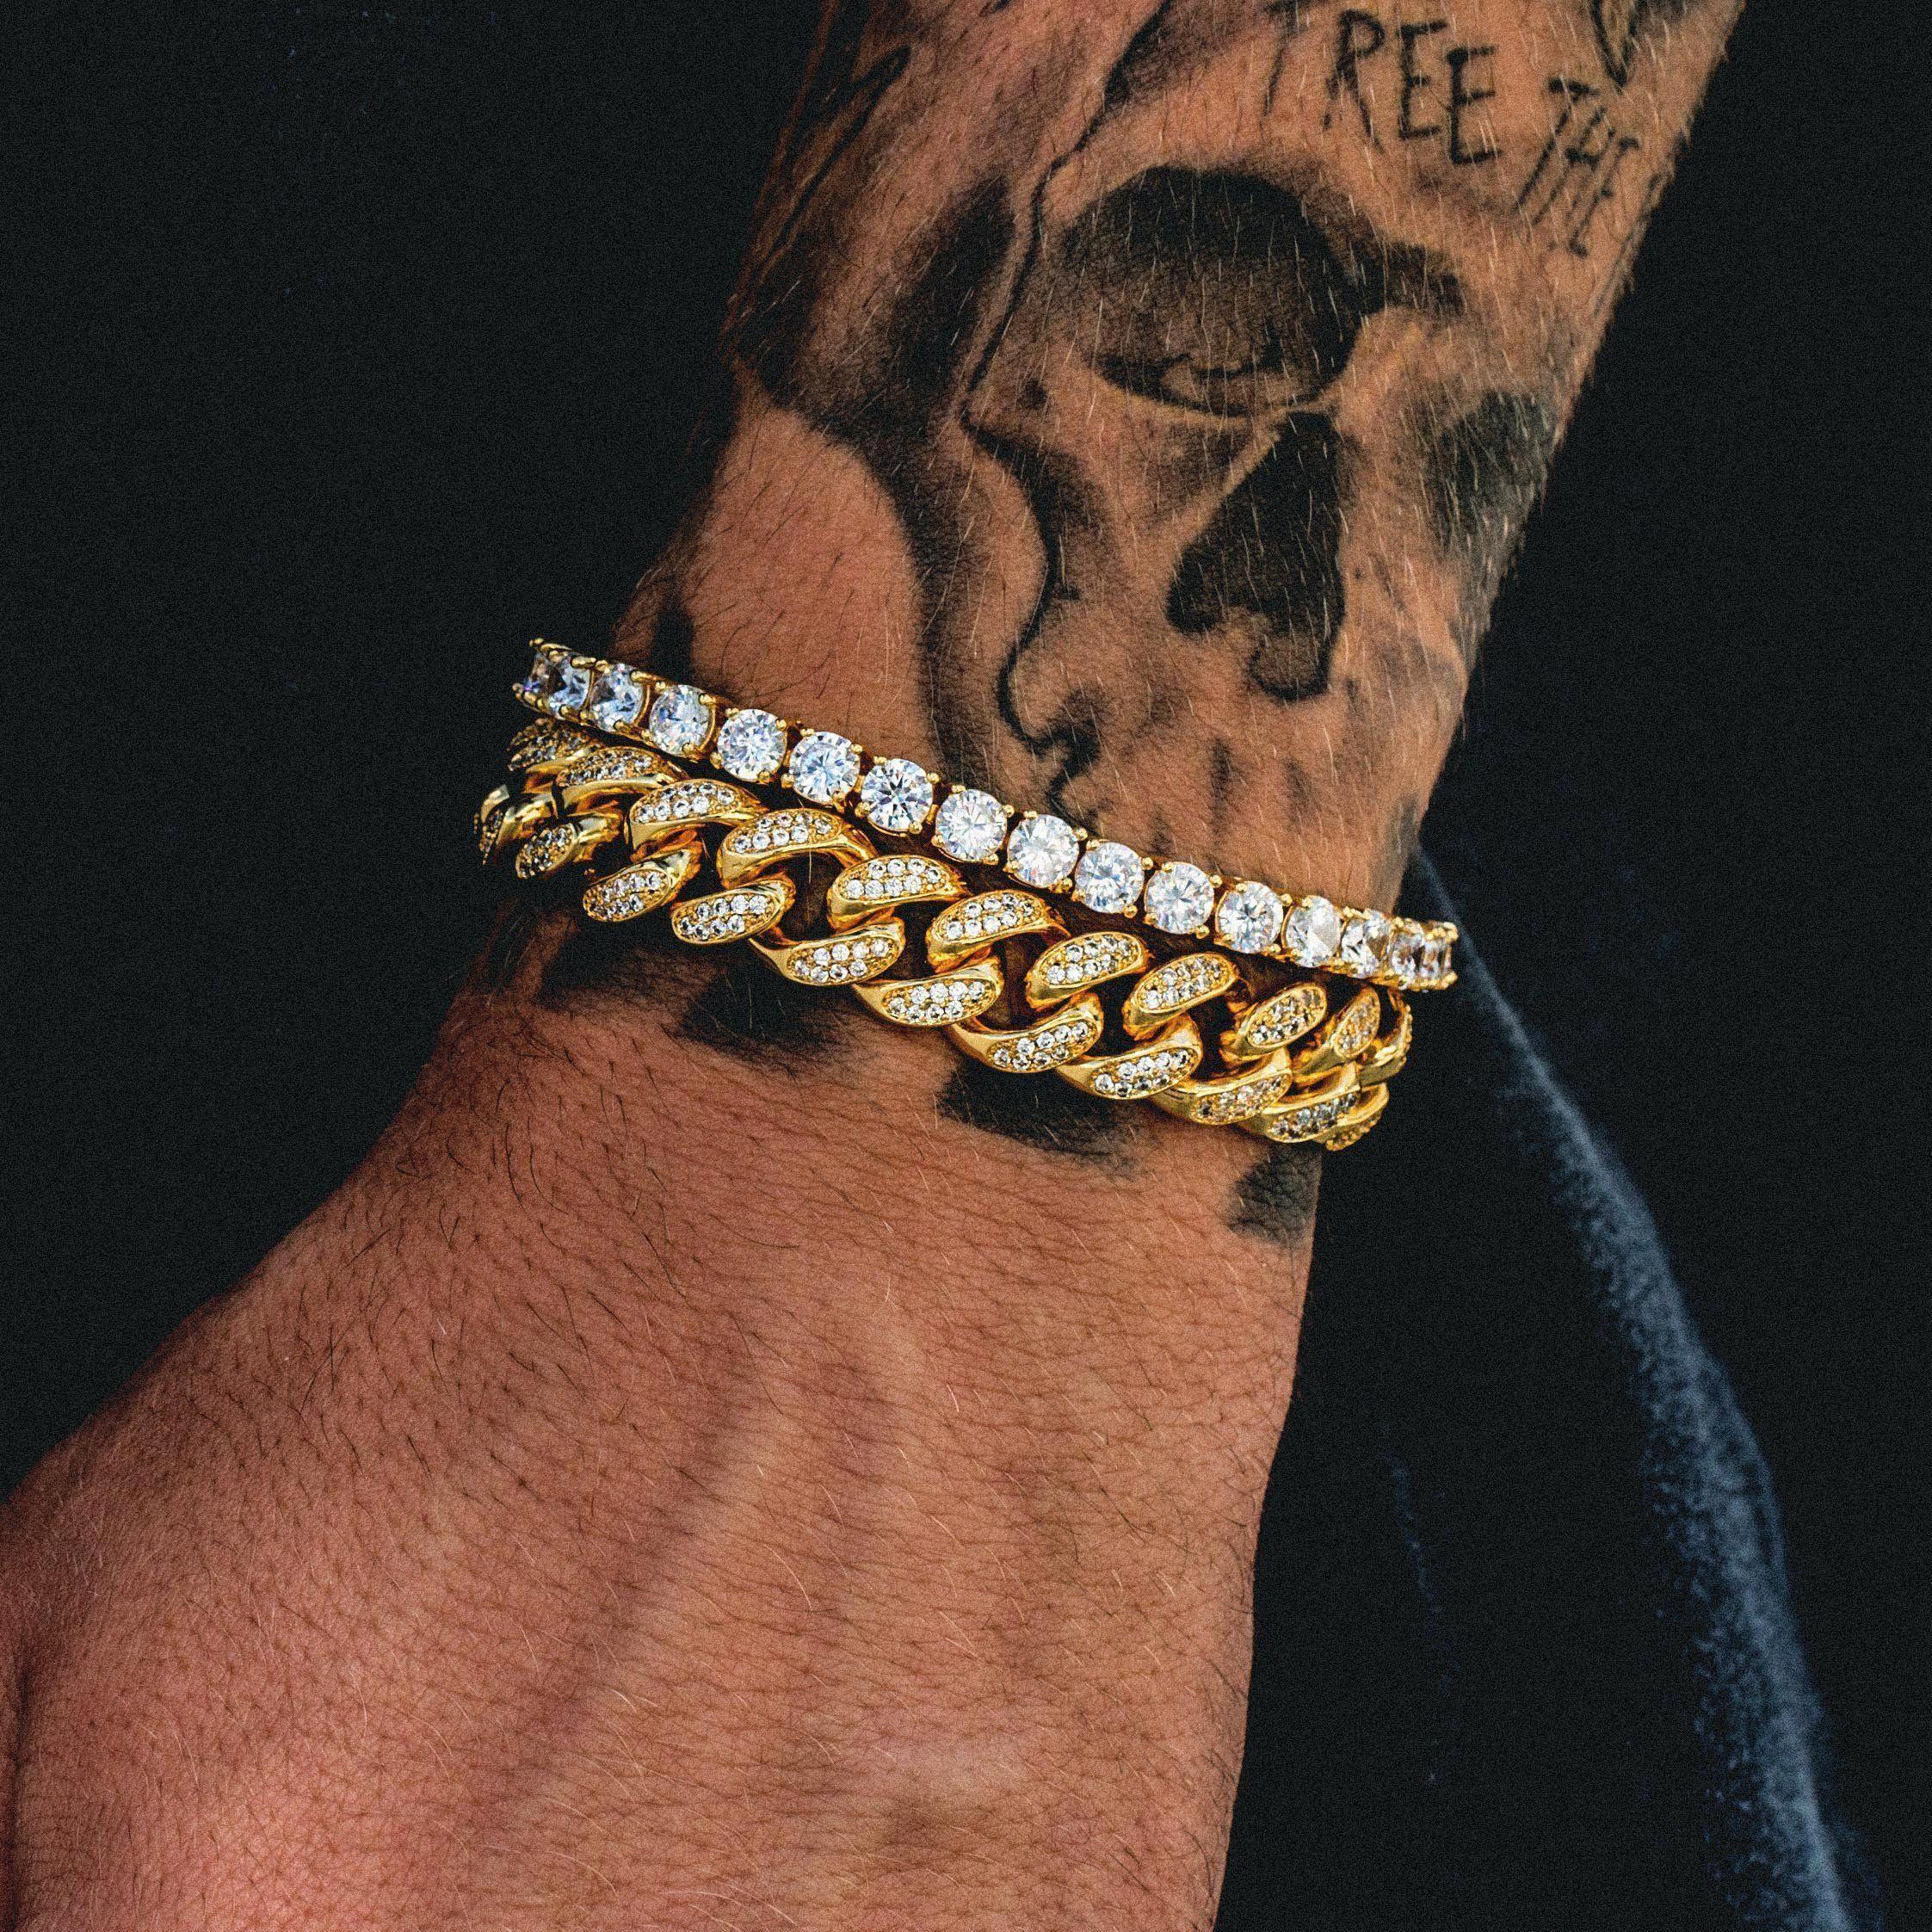 Diamond Cuban Link 10mm Tennis Bracelet Bundle Tennisbracelet Mens Diamond Bracelet Mens Jewelry Bracelet Bracelets For Men